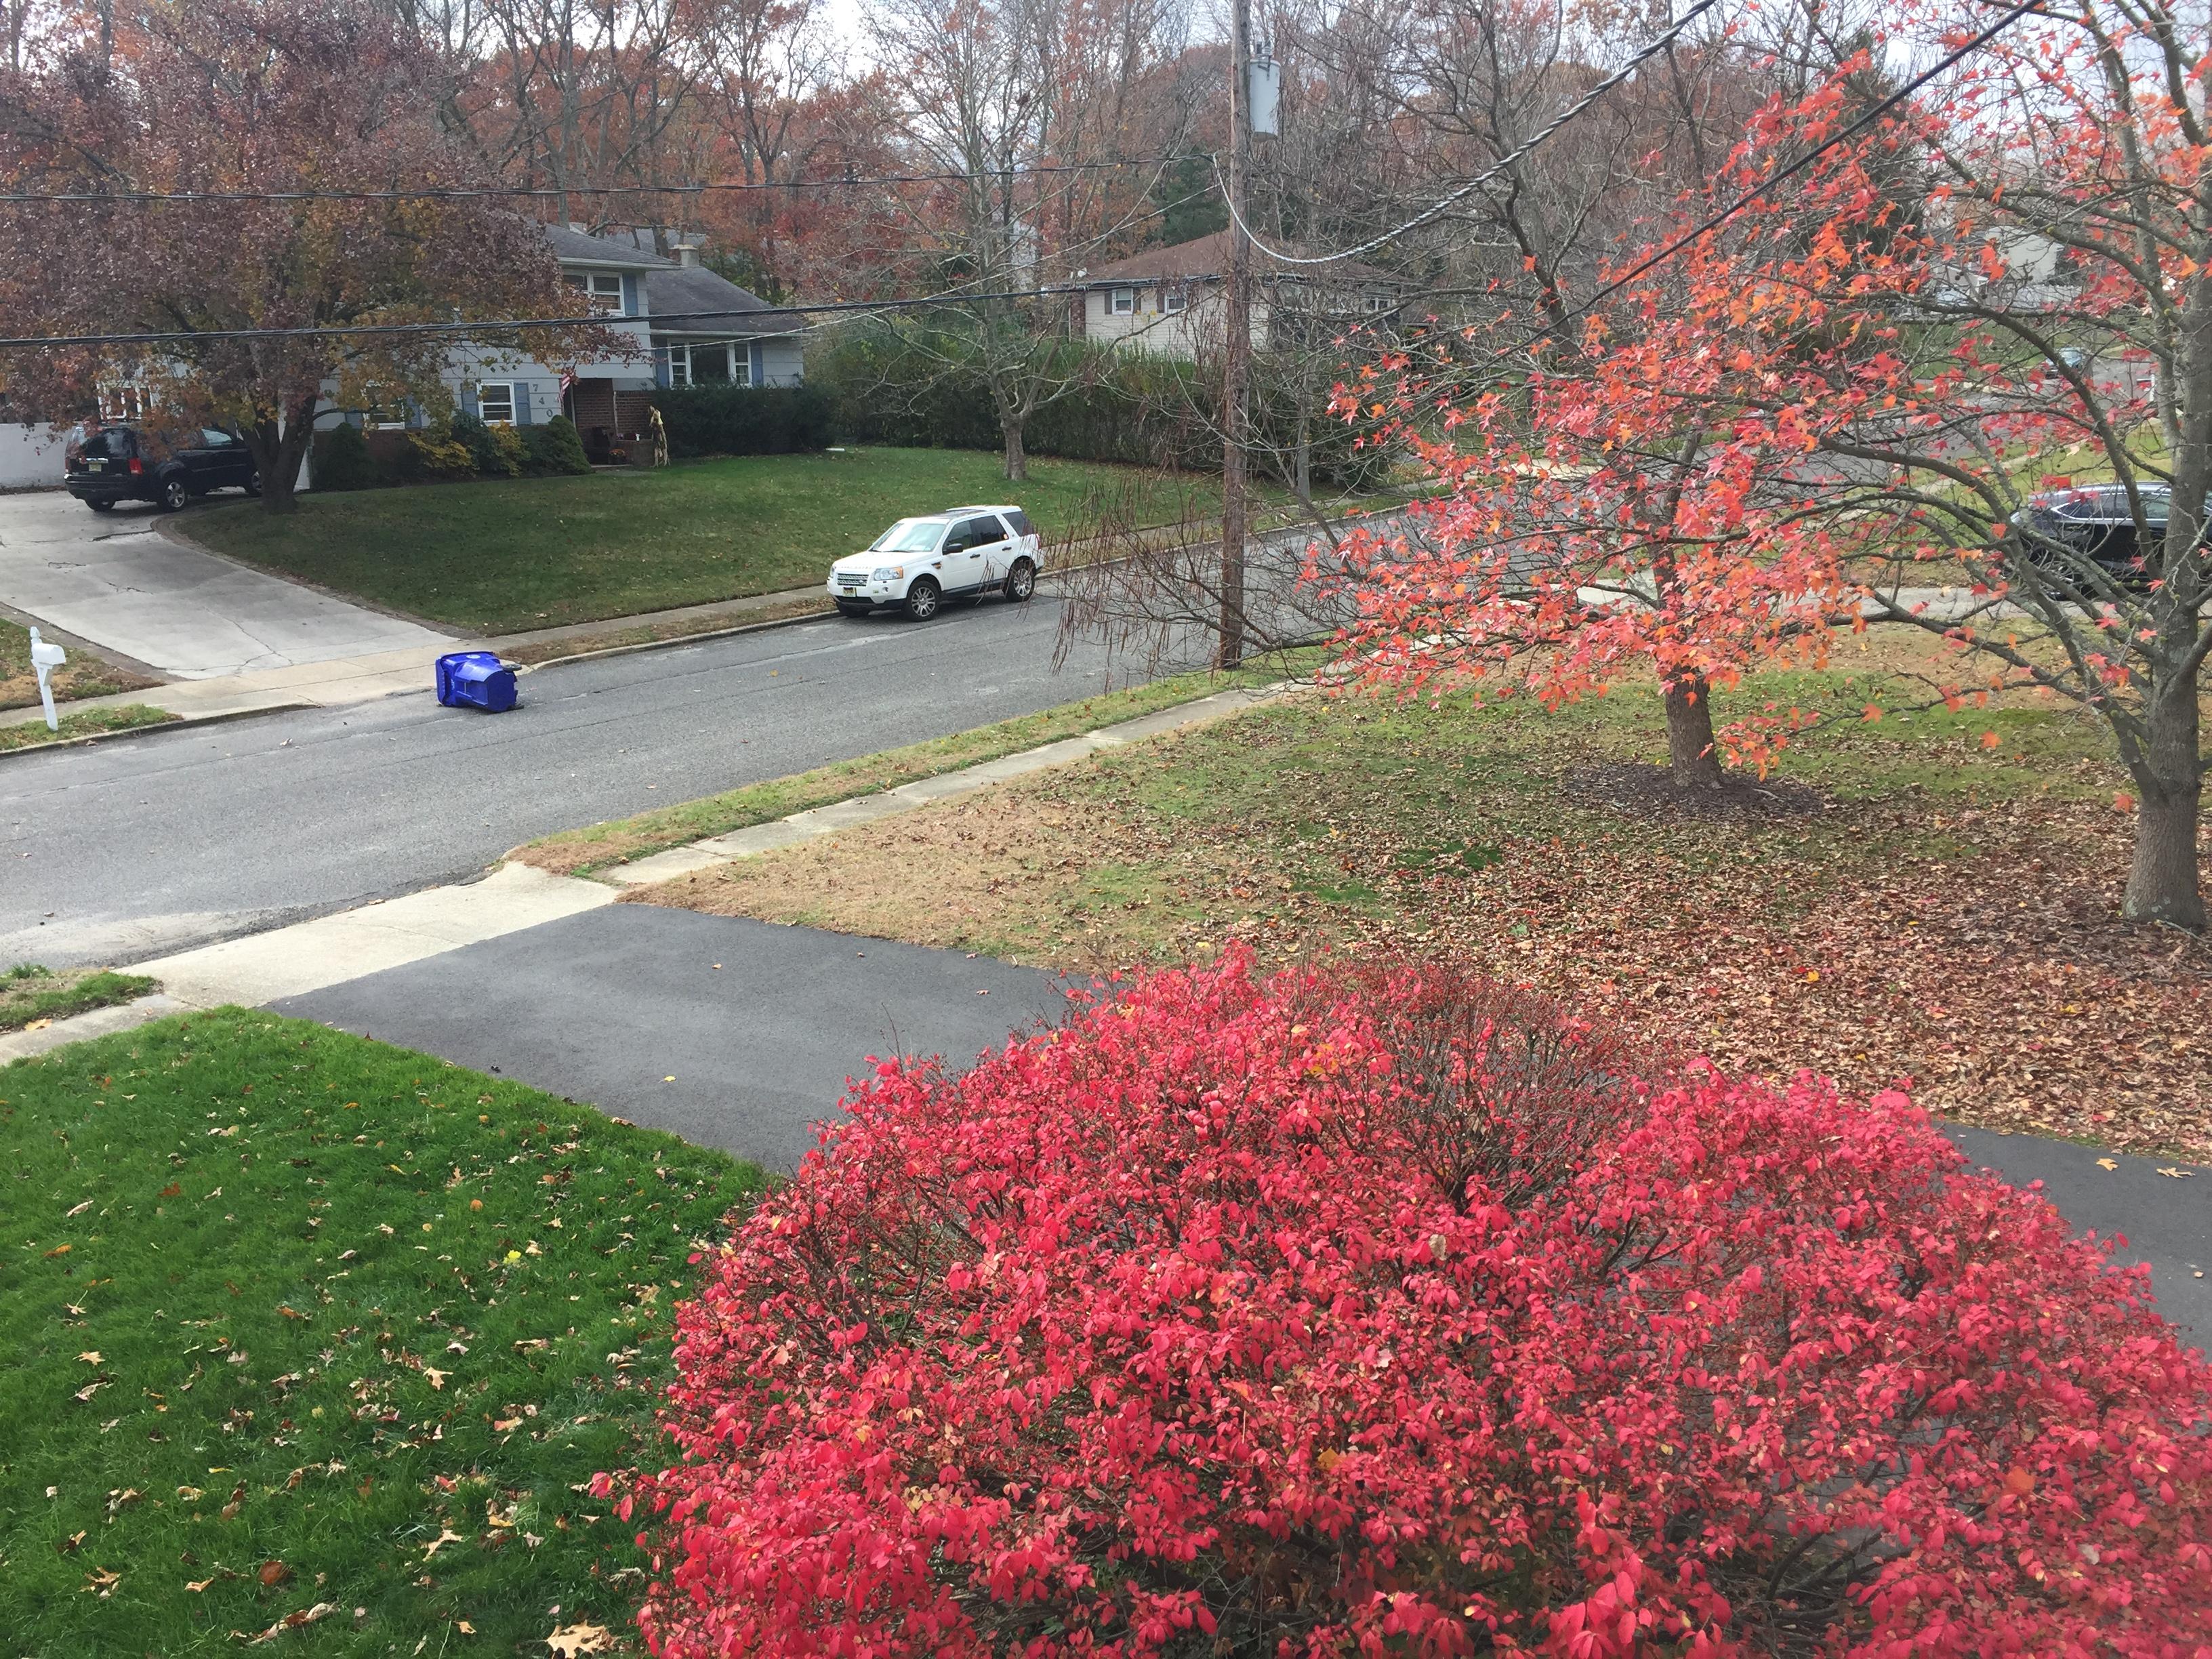 Fall weather in Ocean County, NJ, Nov. 21, 2016. (Photo: Daniel Nee)